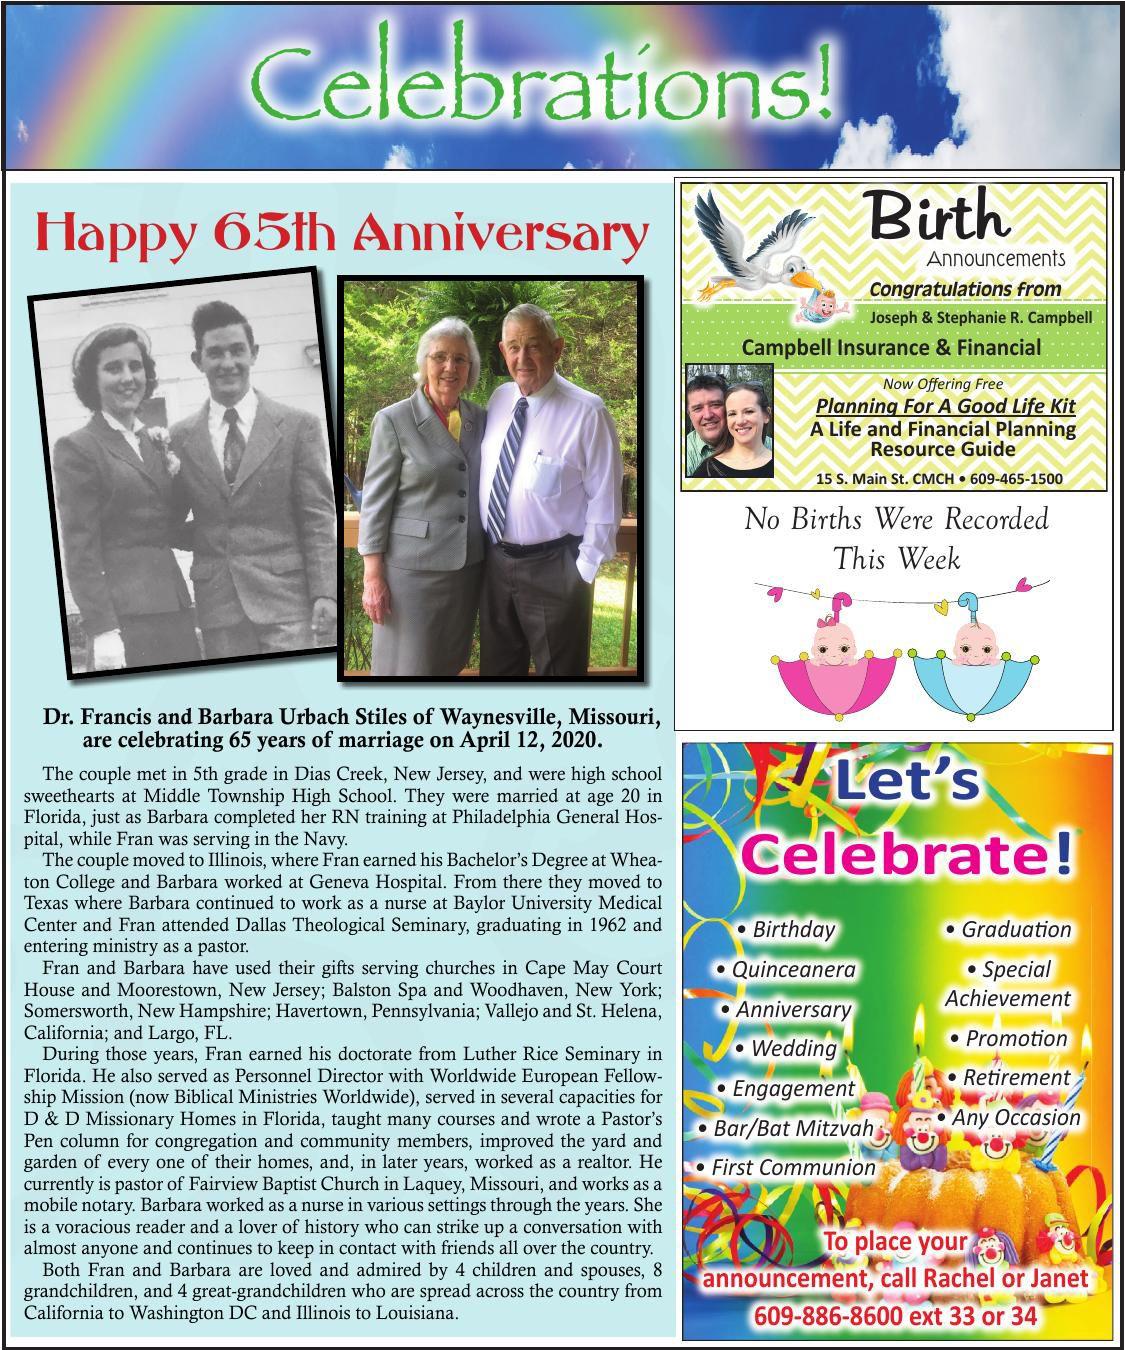 Celebrations for 04-08-2020